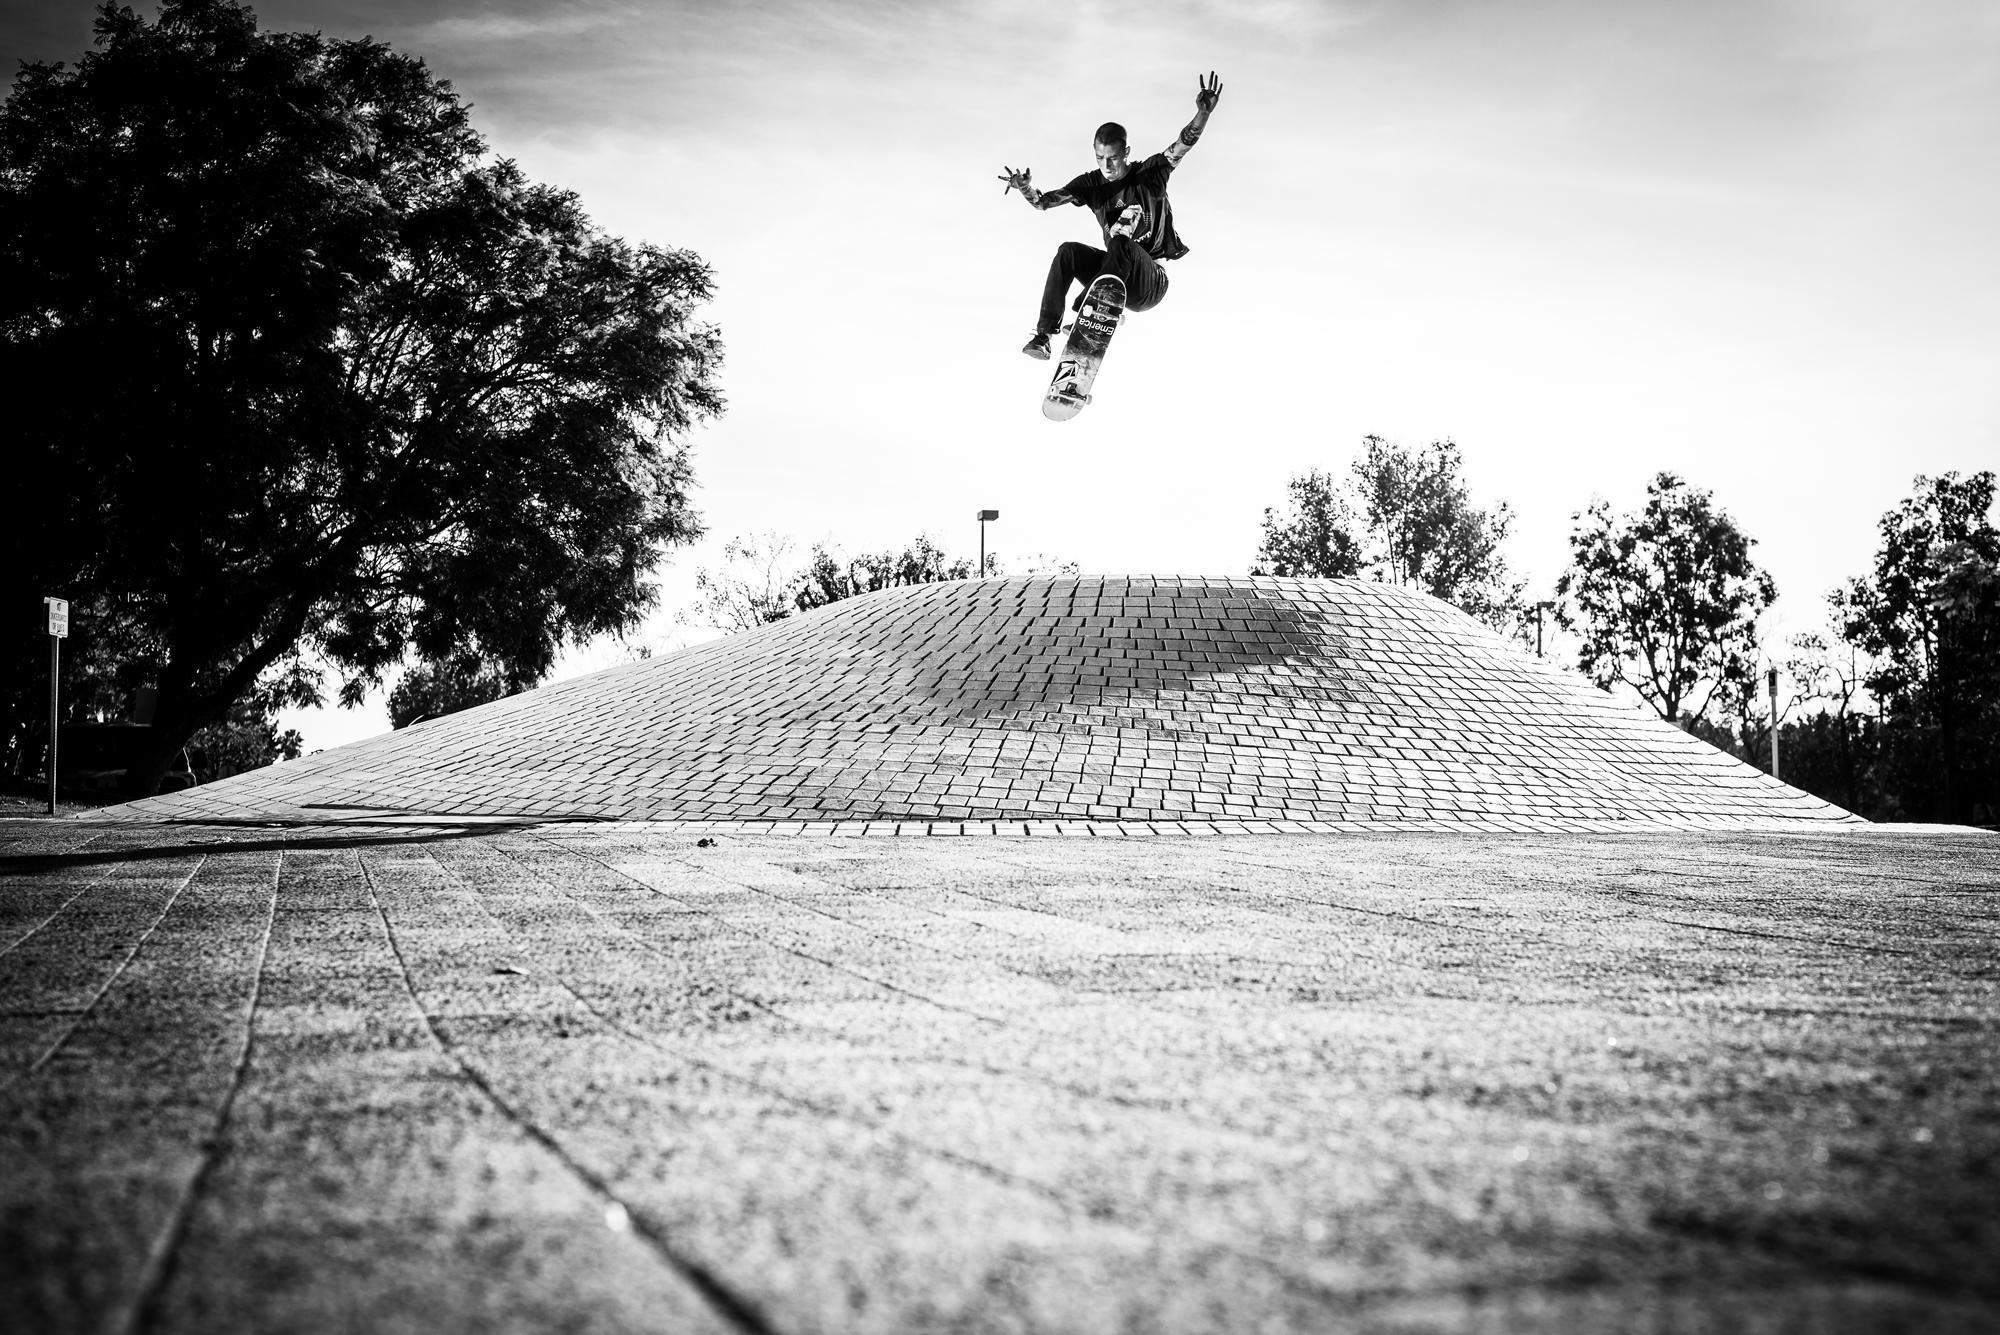 Colin Provost | Impossible | Los Angeles, CA